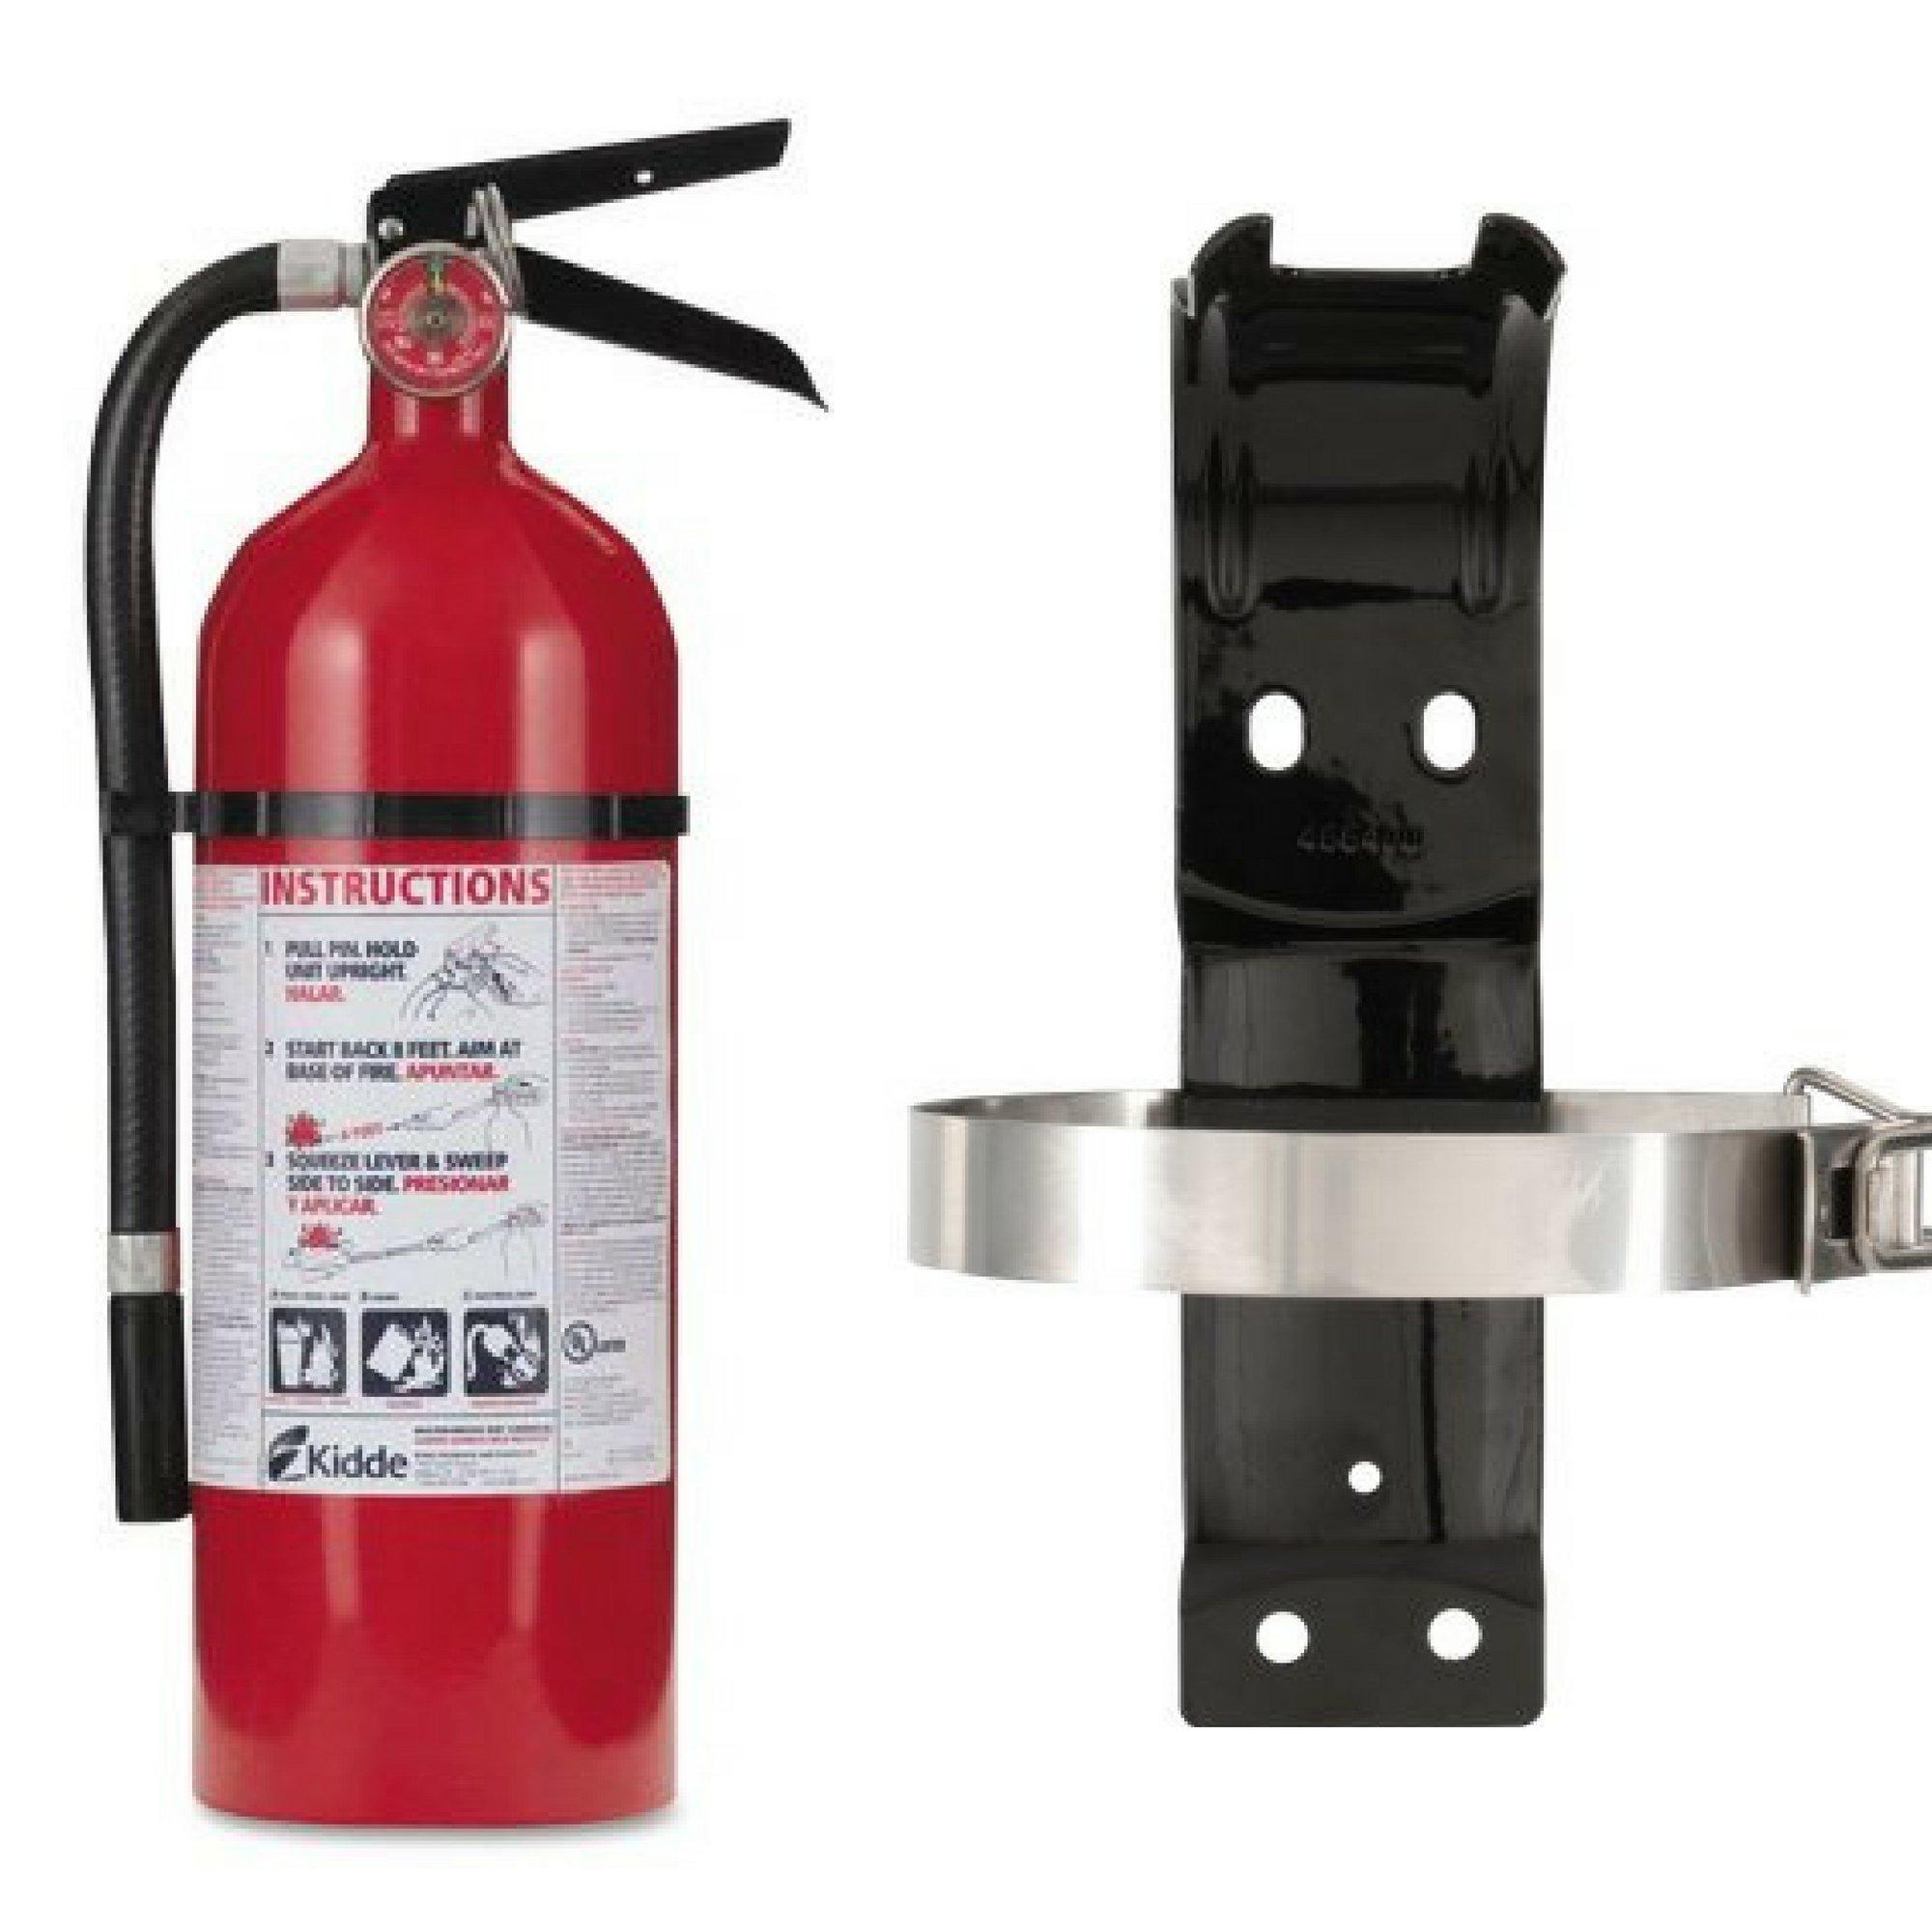 Kidde 21005779 Pro 210 Fire Extinguisher, ABC, 160CI, 4 lbs, 1 Pack & Bracket Box - Bundle Set